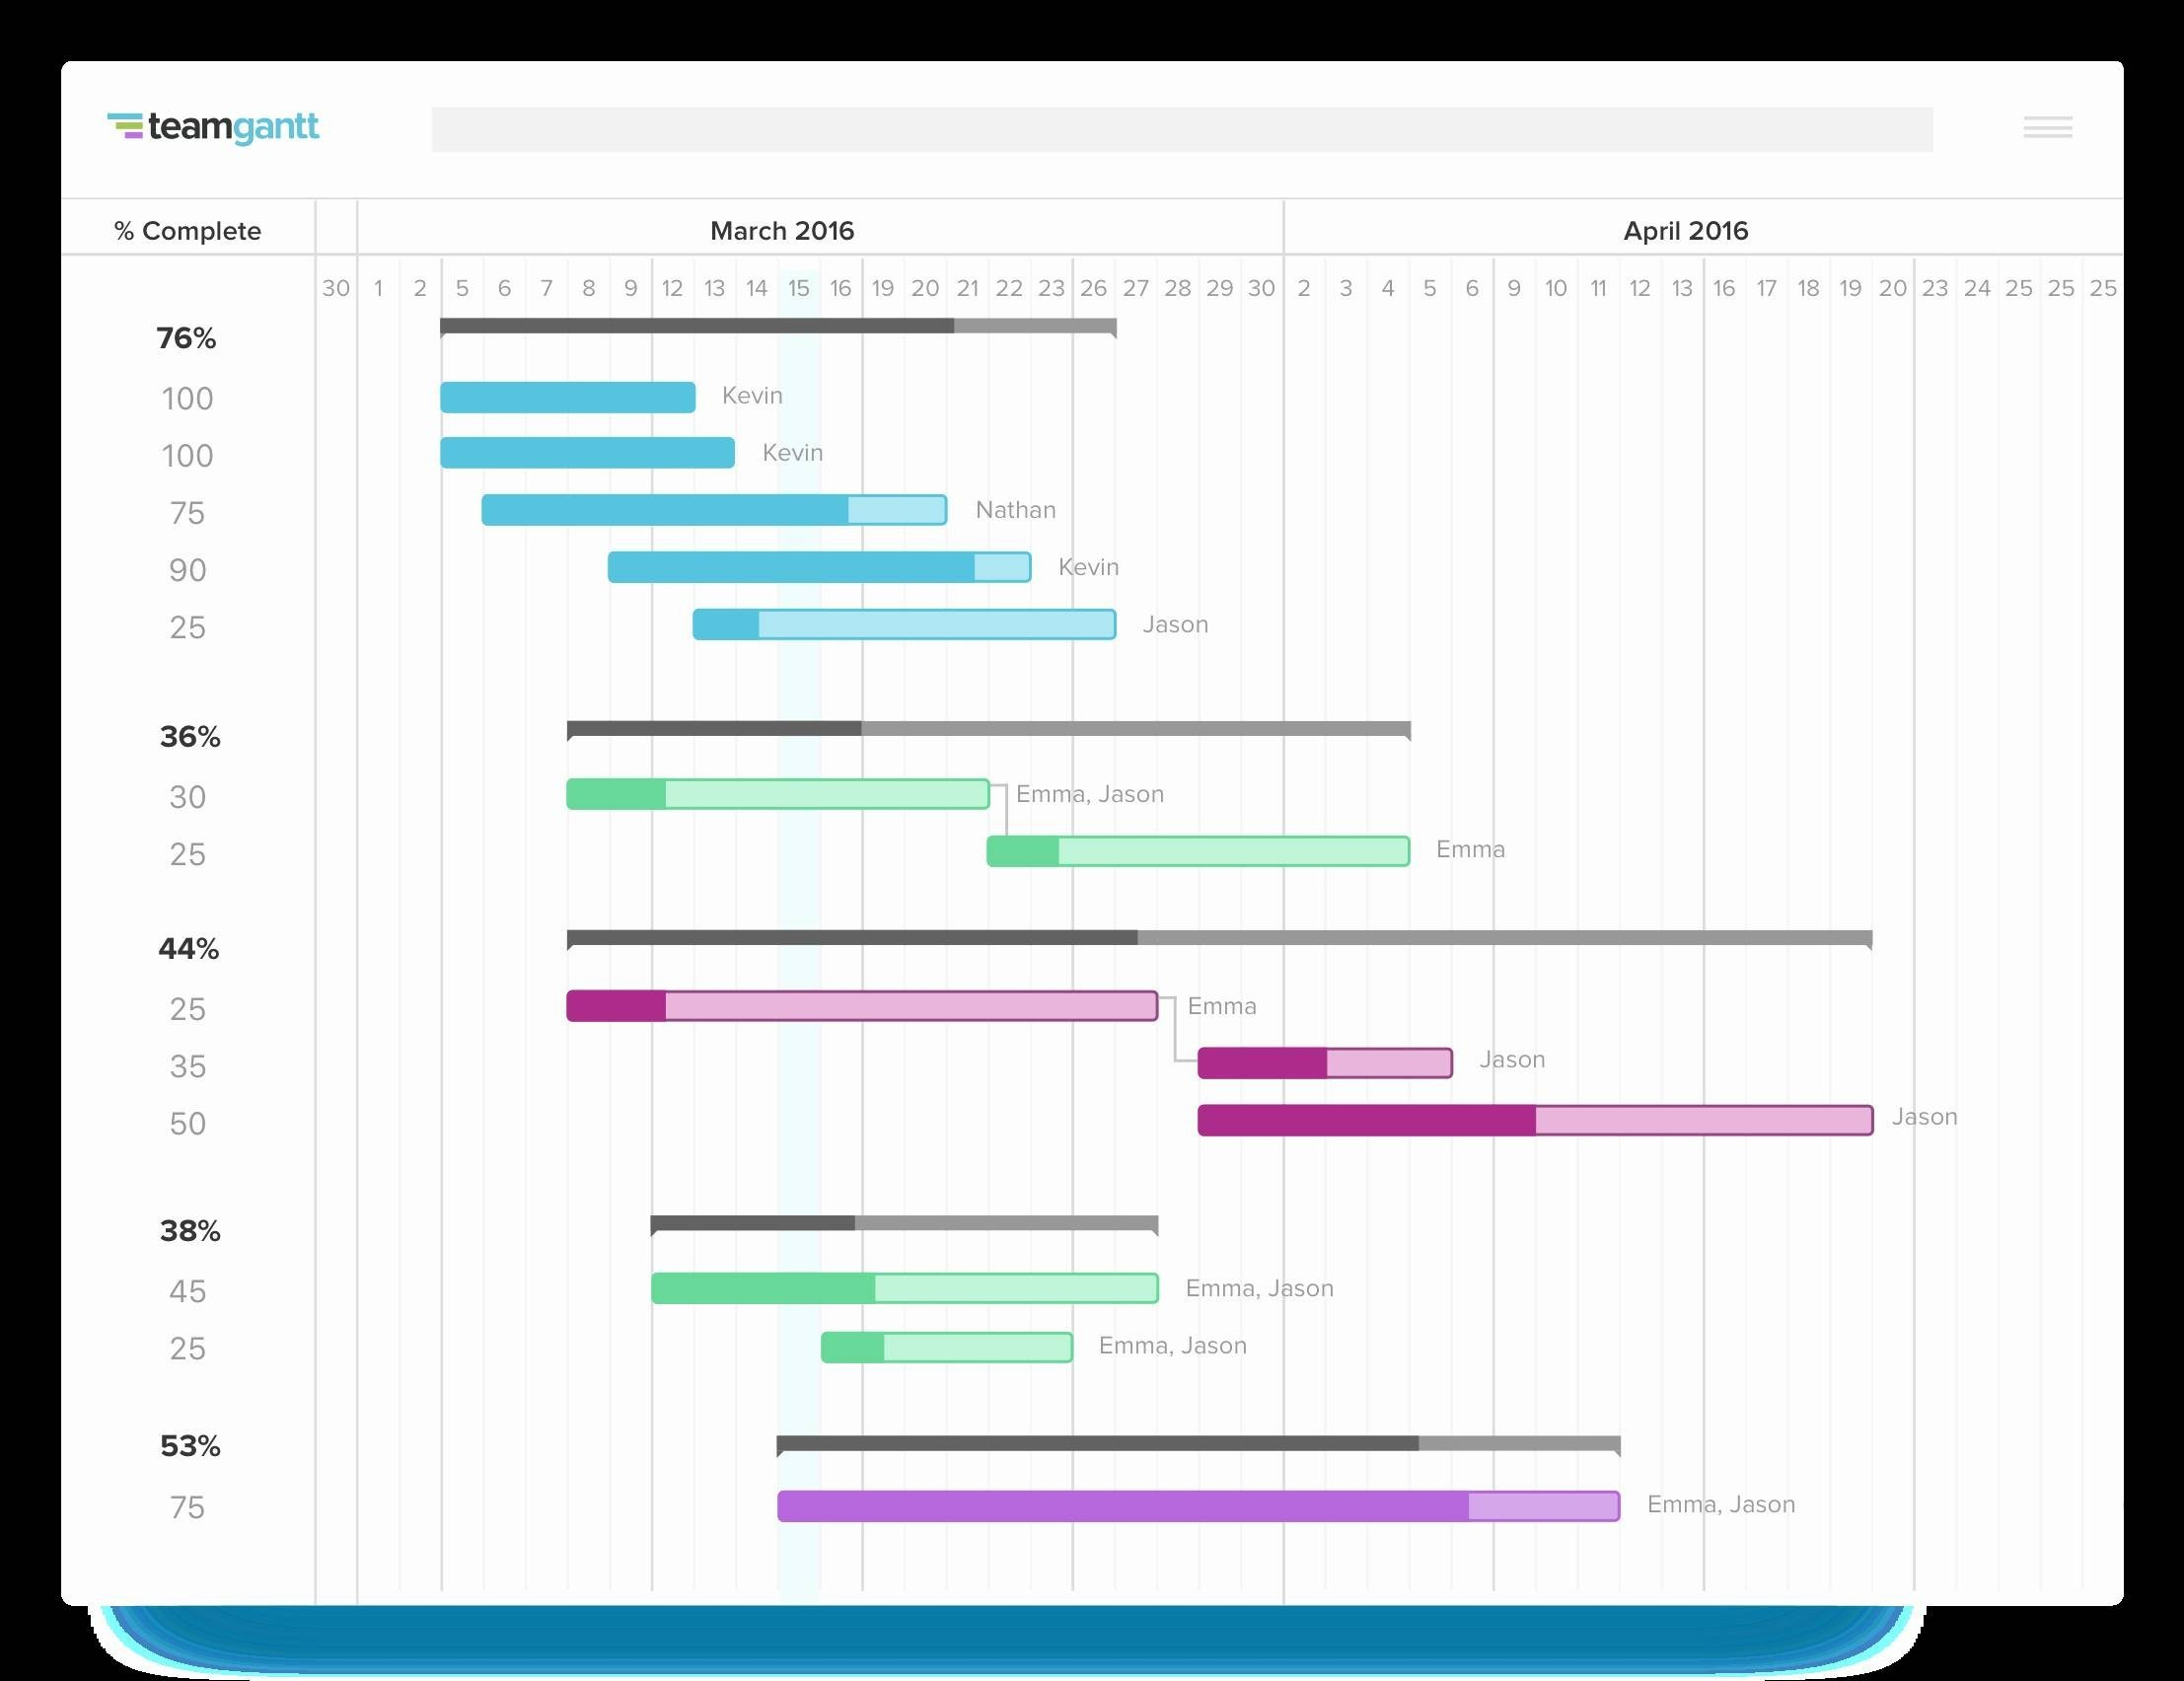 Excel Flowchart Template Visio Gantt Chart Template In Visio Gantt Chart Template Download